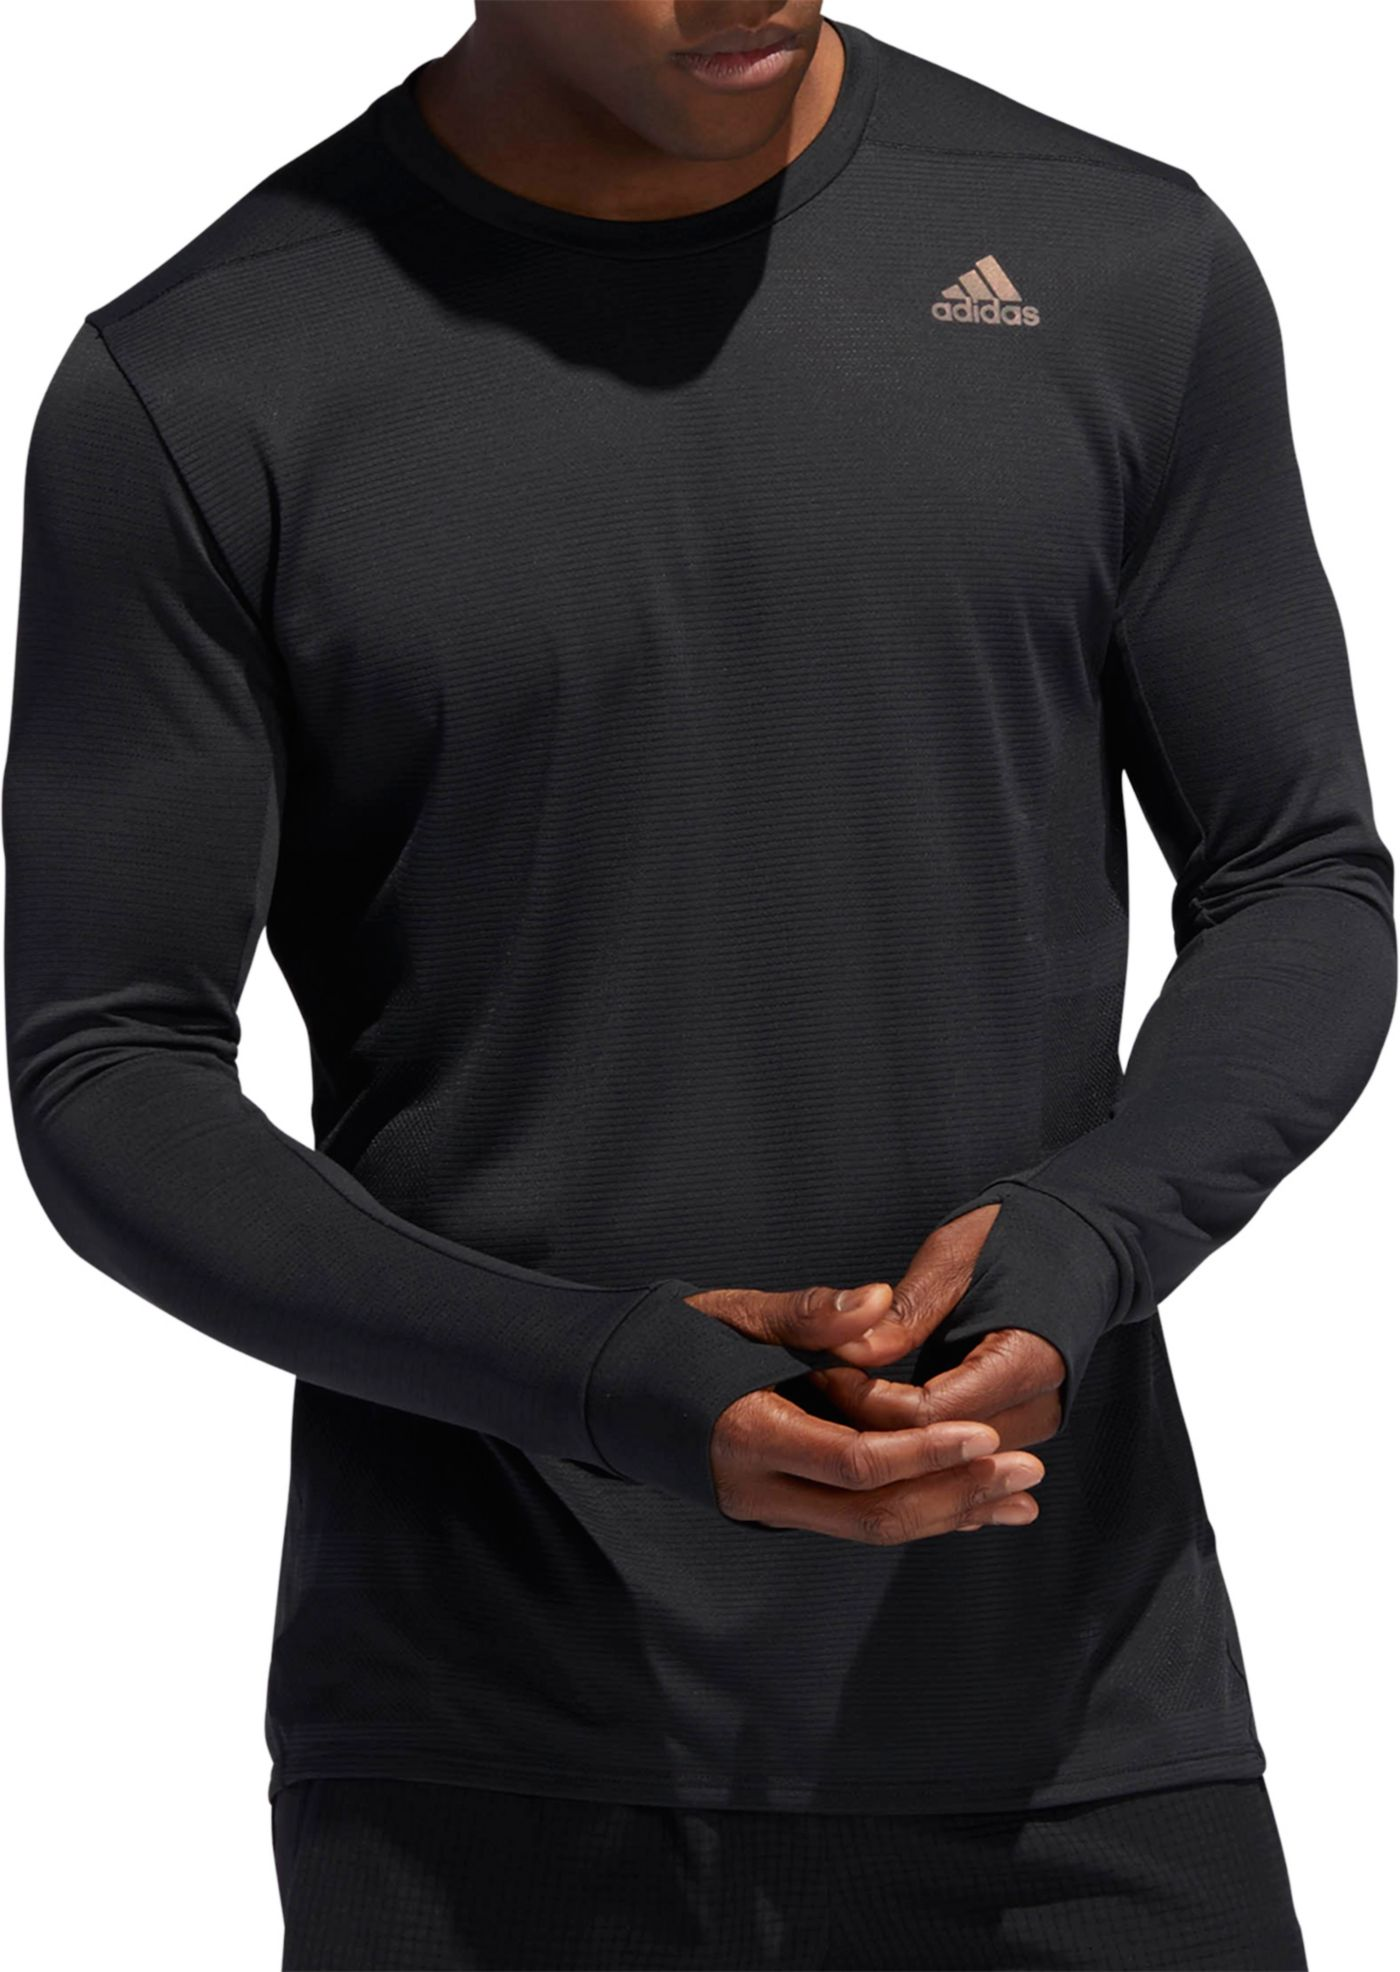 adidas Men's Supernova Running Long Sleeve Shirt